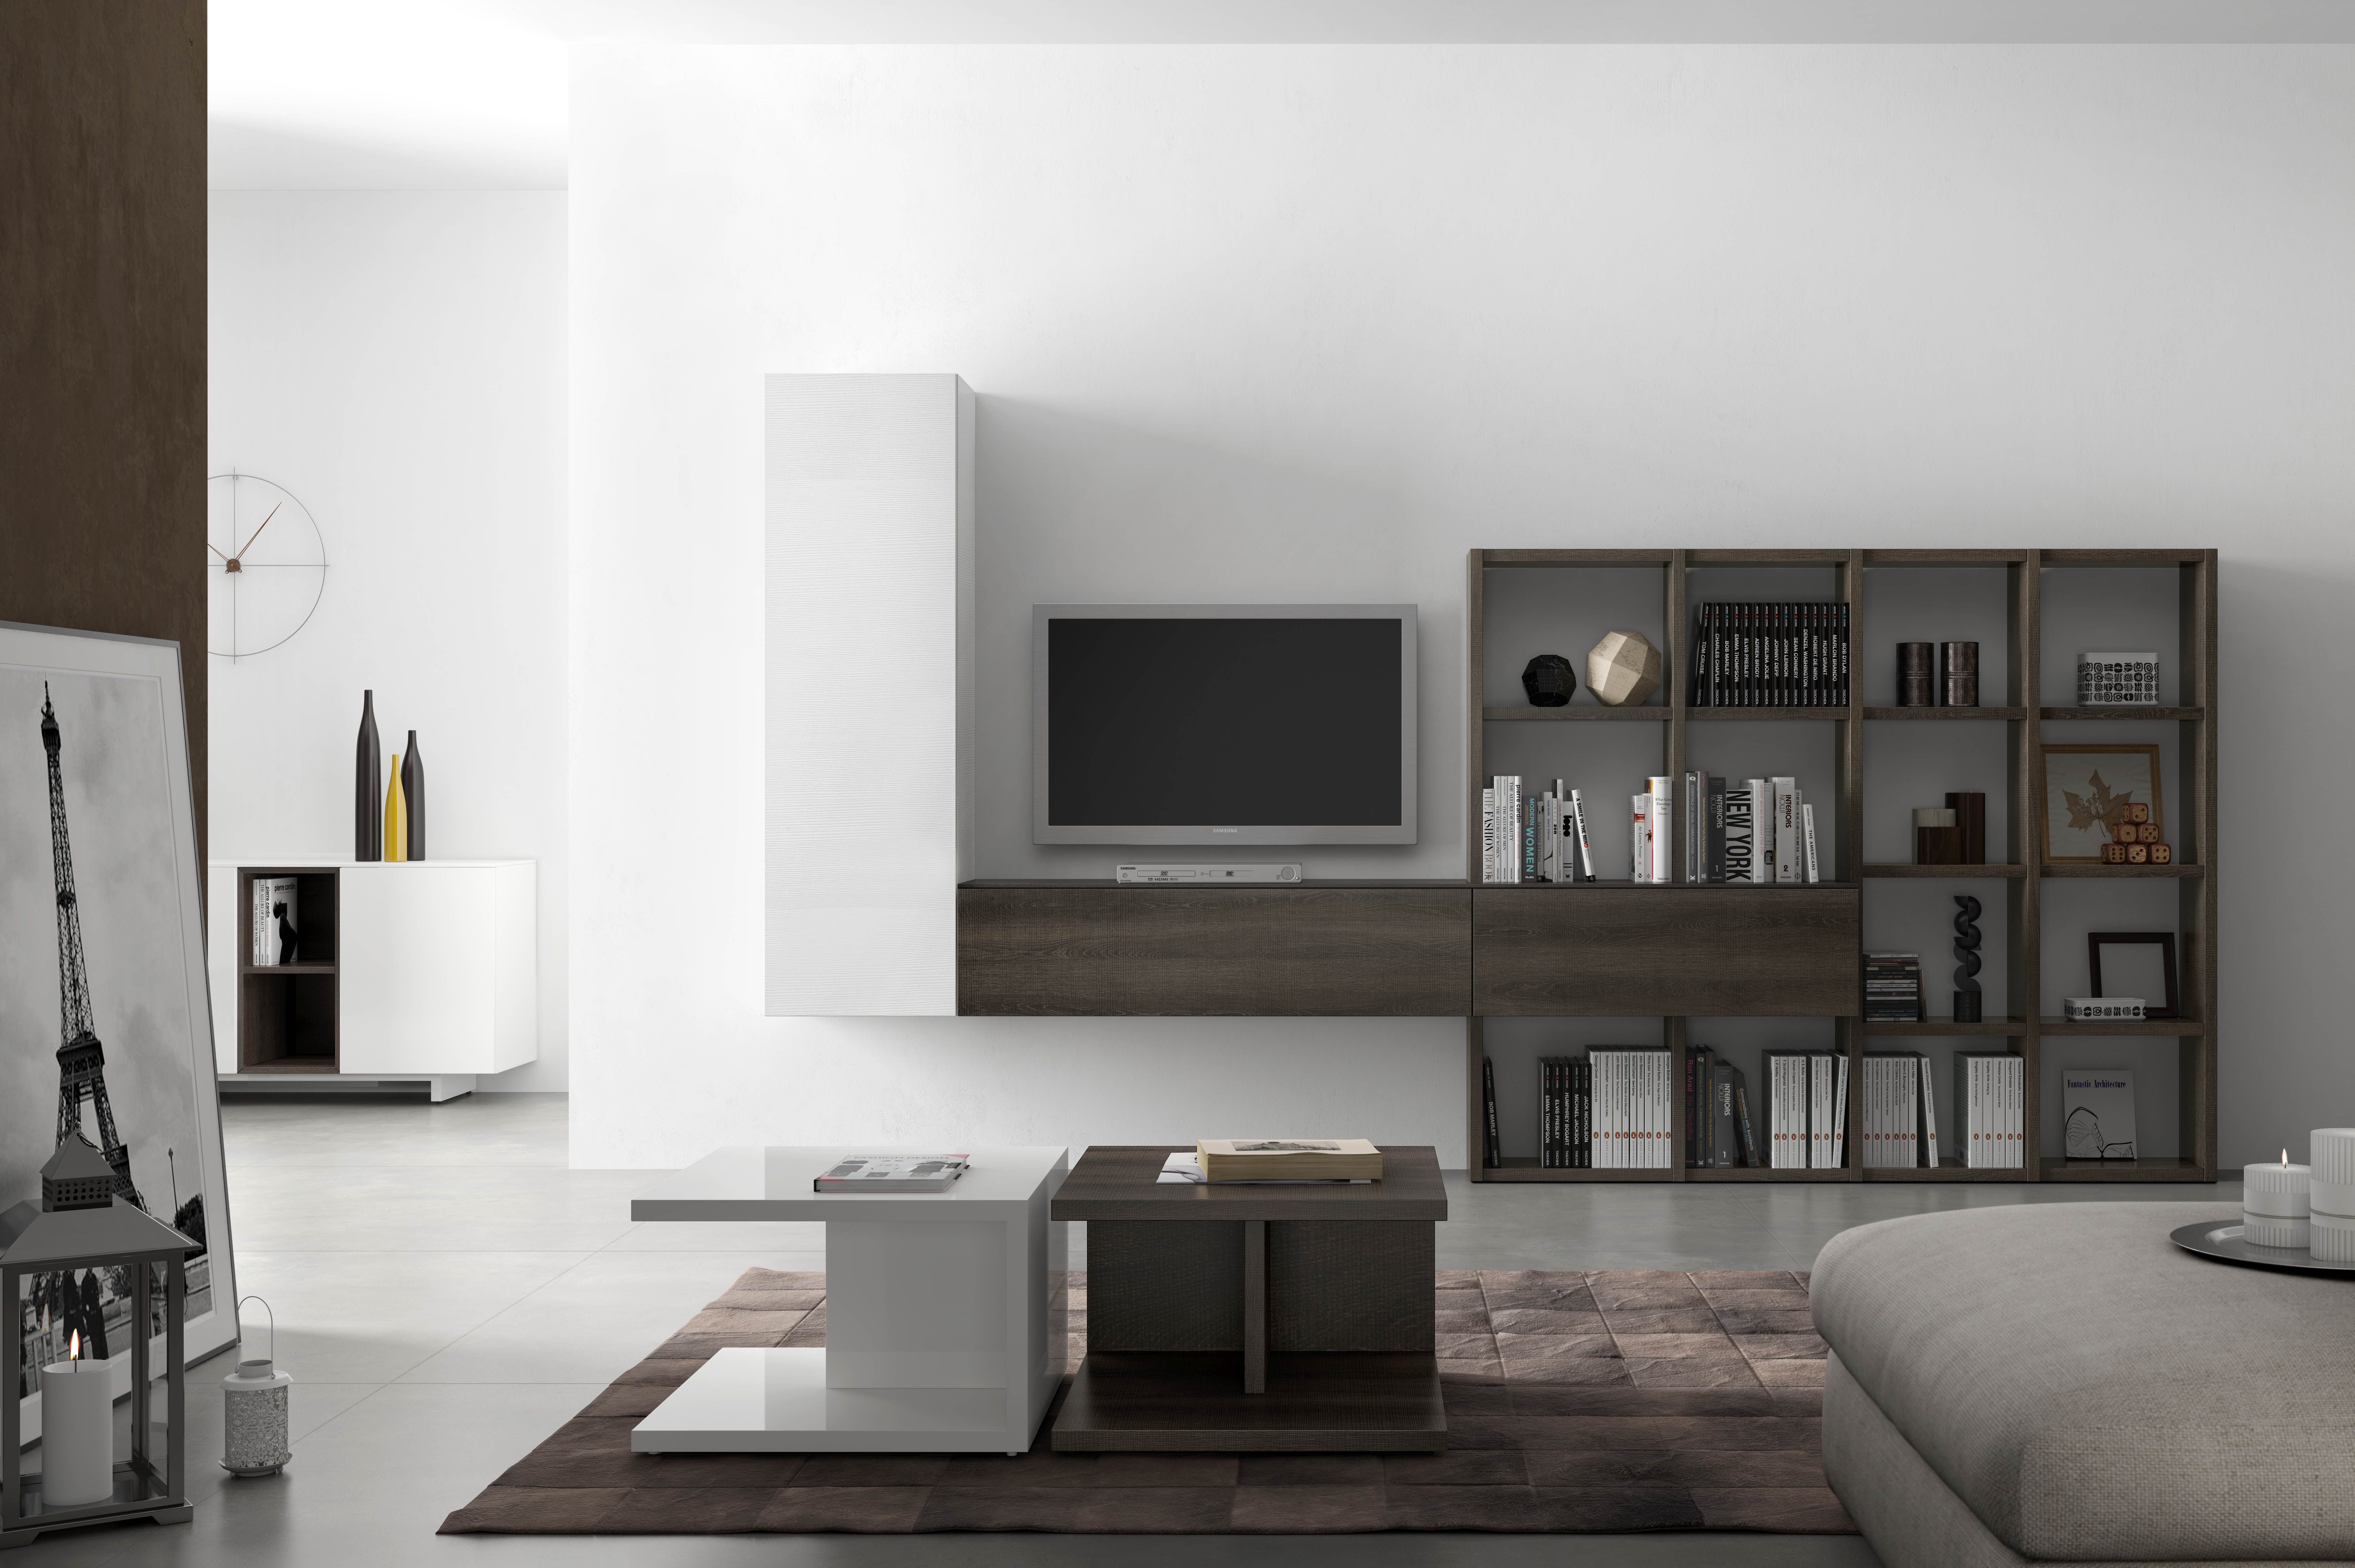 Salones modernos fabricaci n de mobiliario moderno - Muebles capsir ...